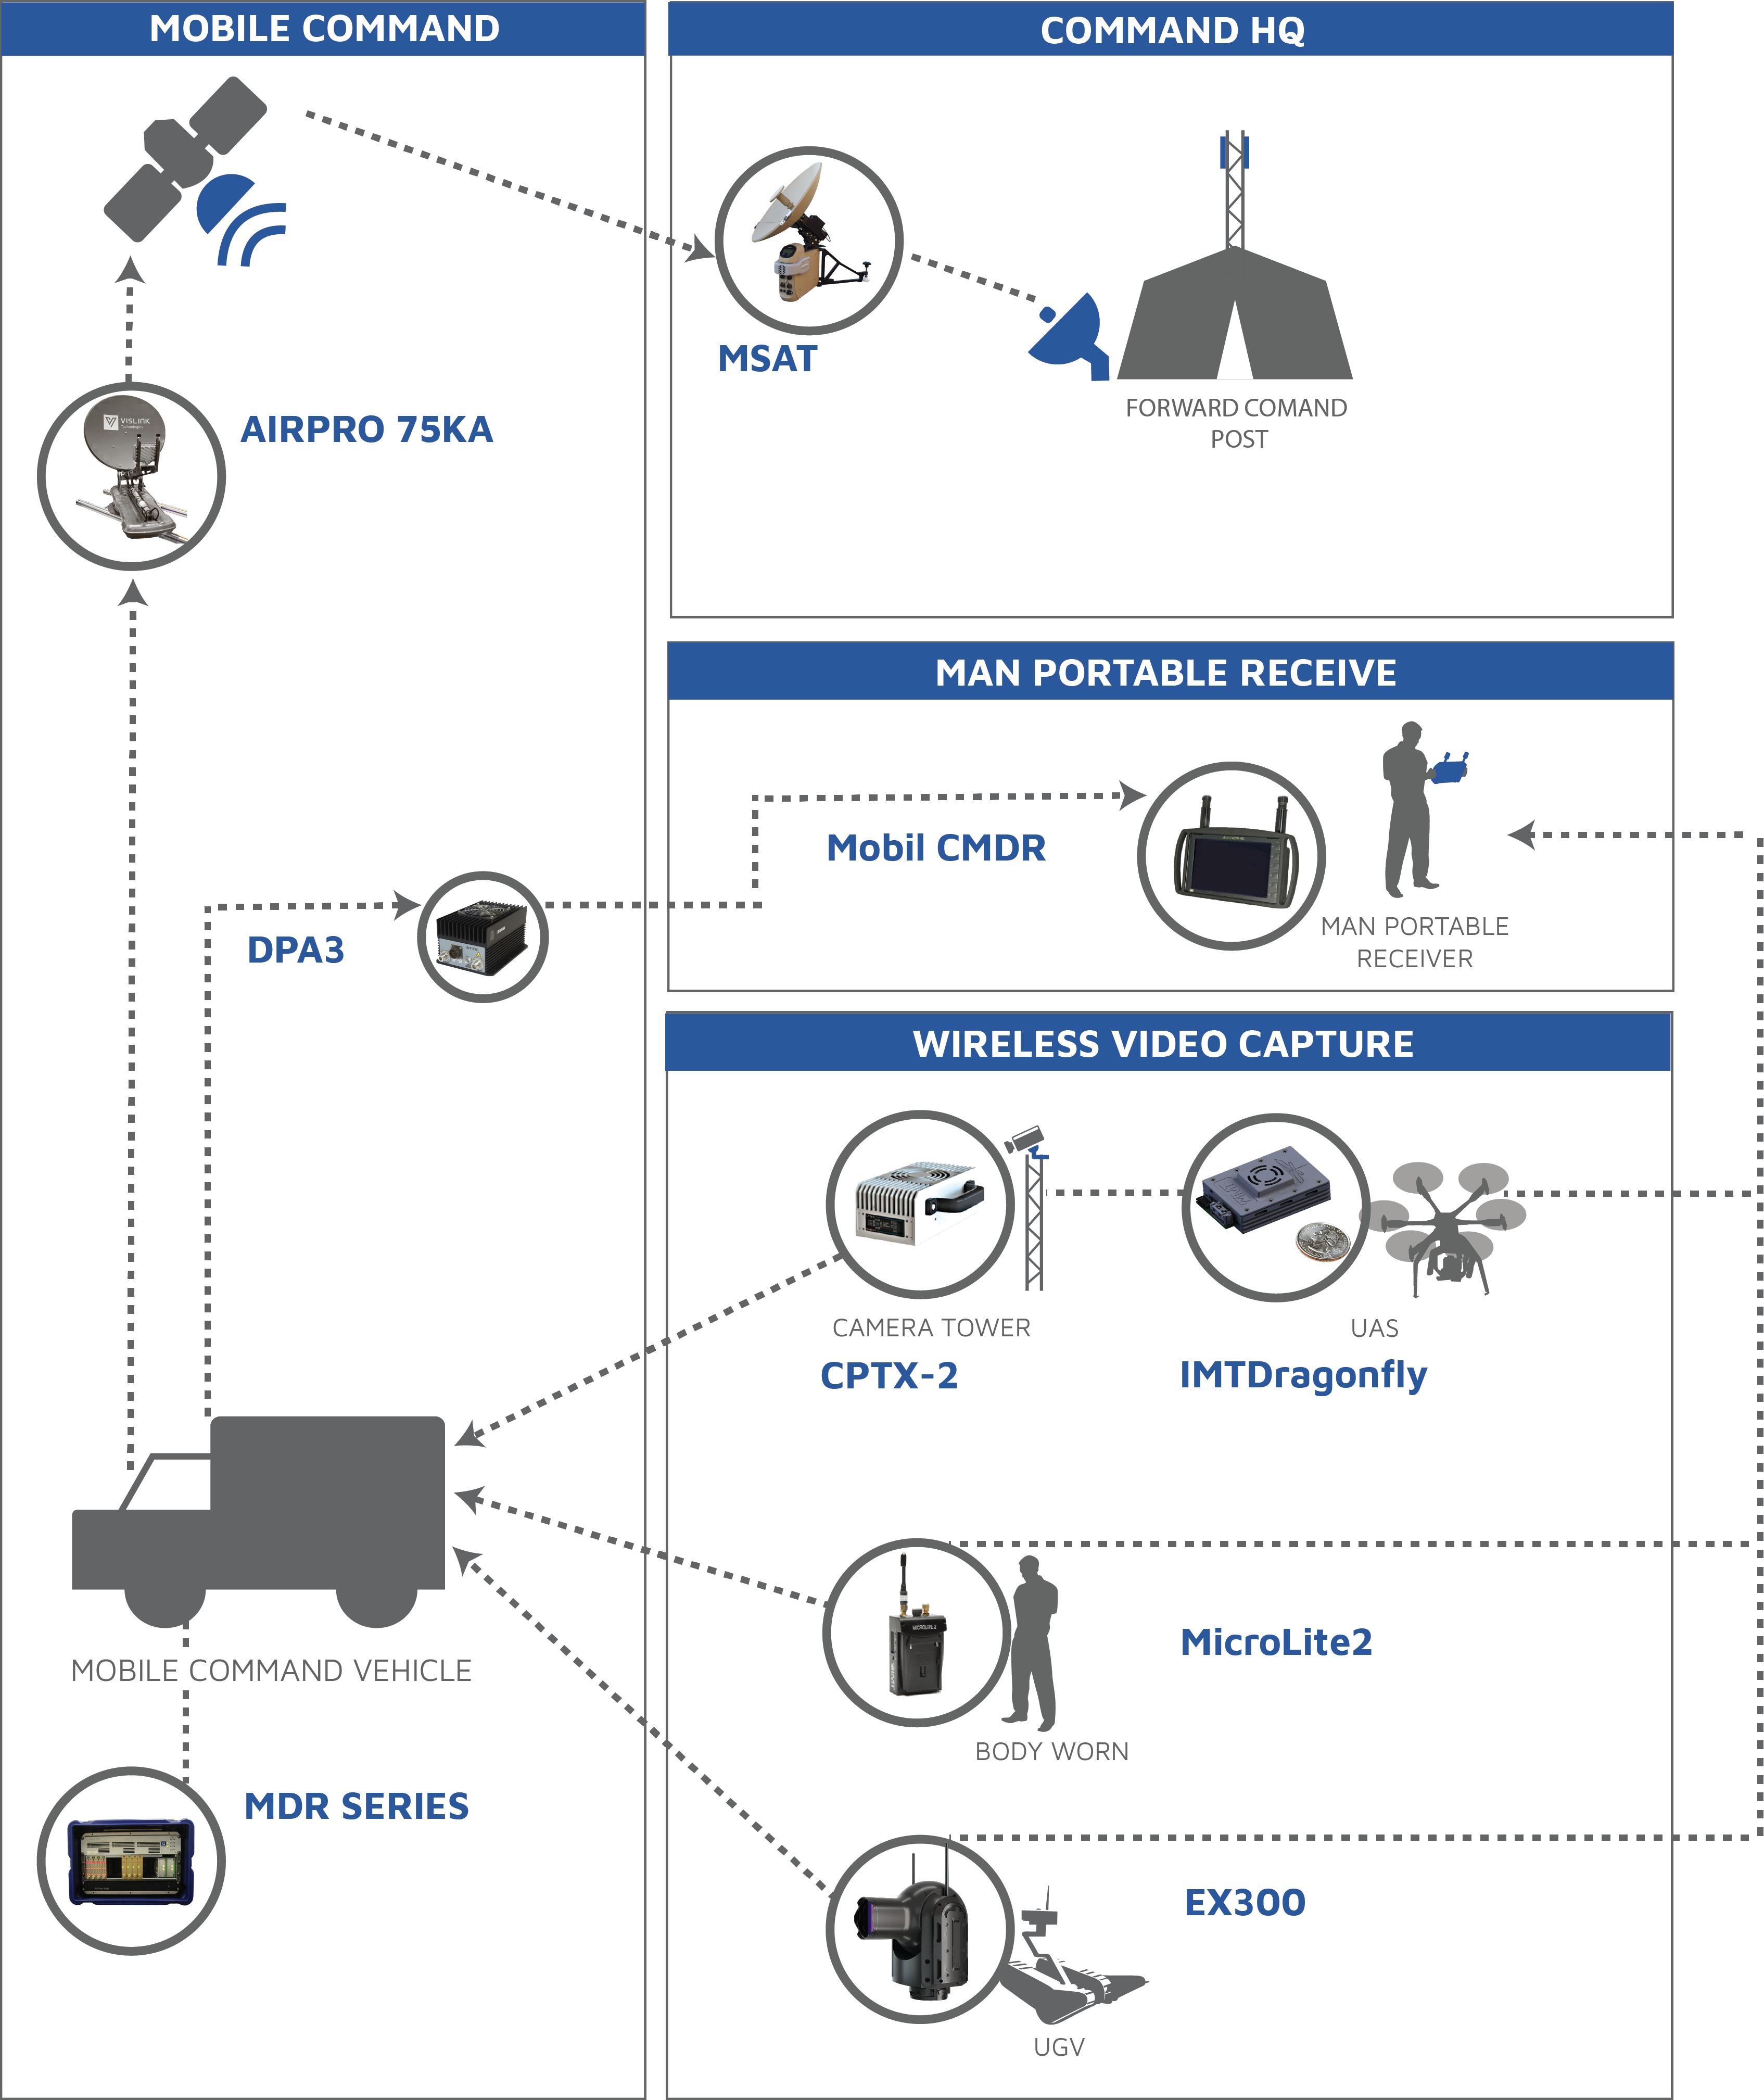 Mobile Command Diagram